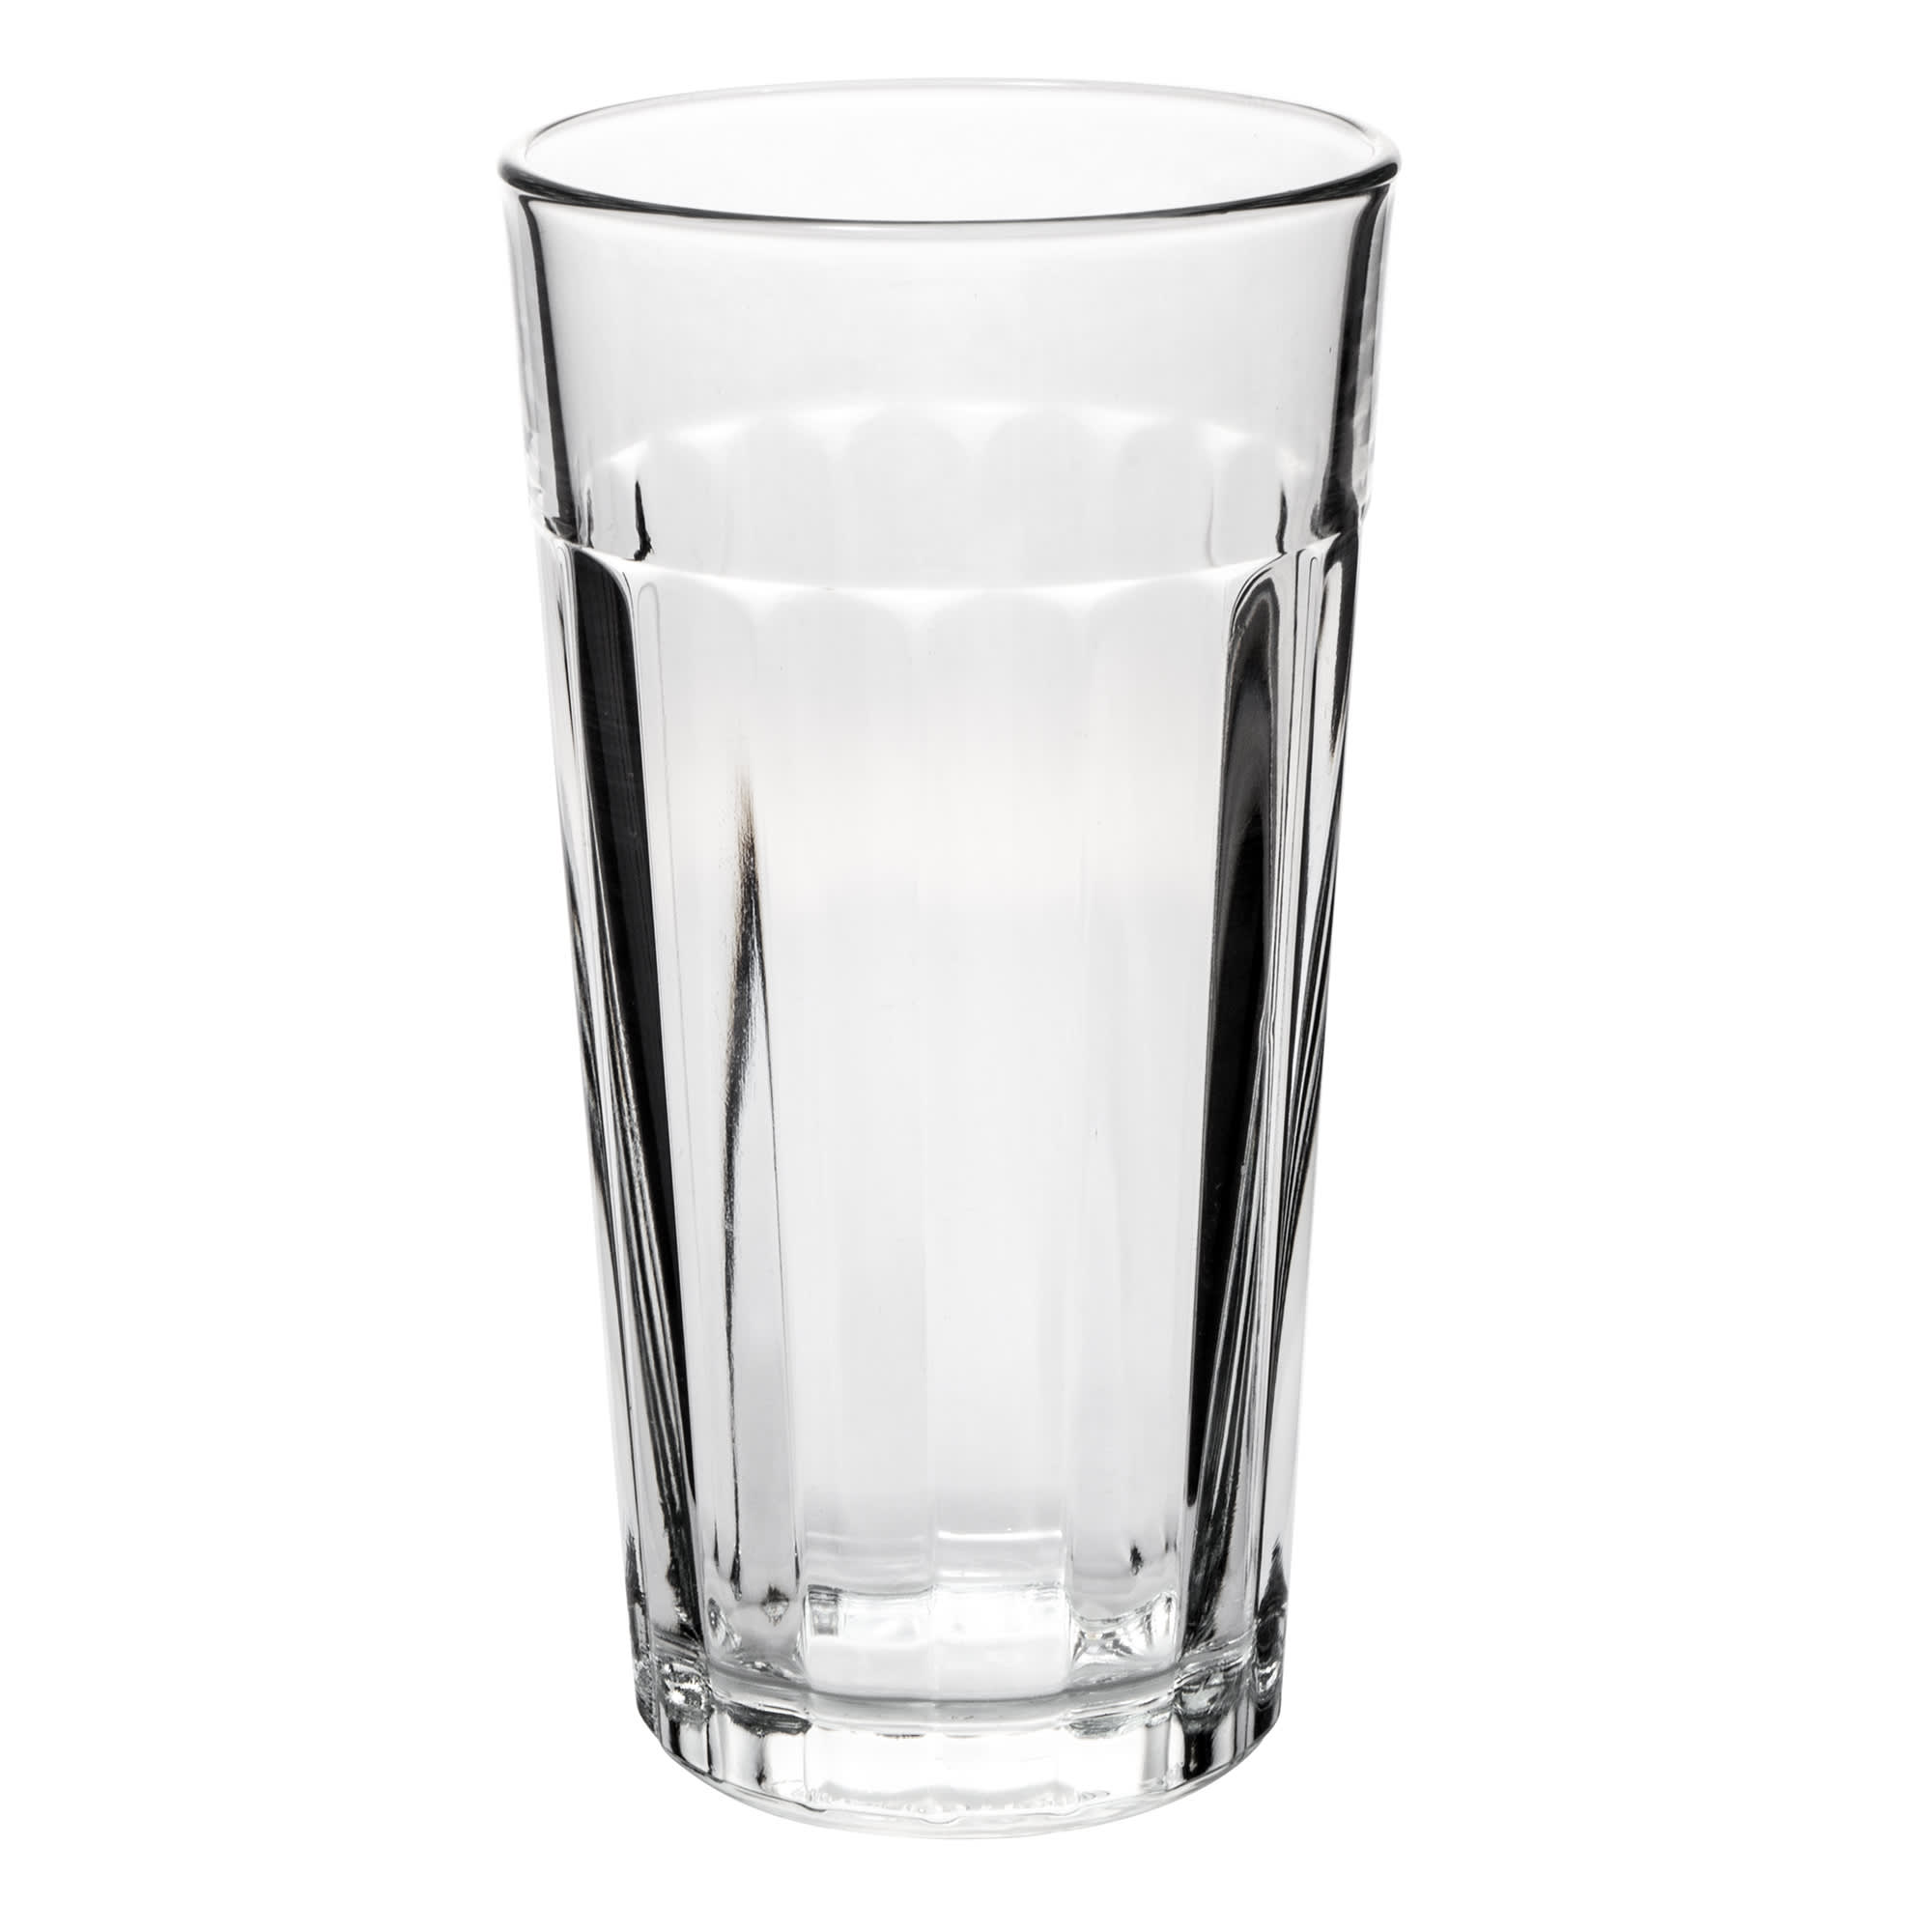 Libbey 15643 20 oz DuraTuff Paneled Glass Tumbler